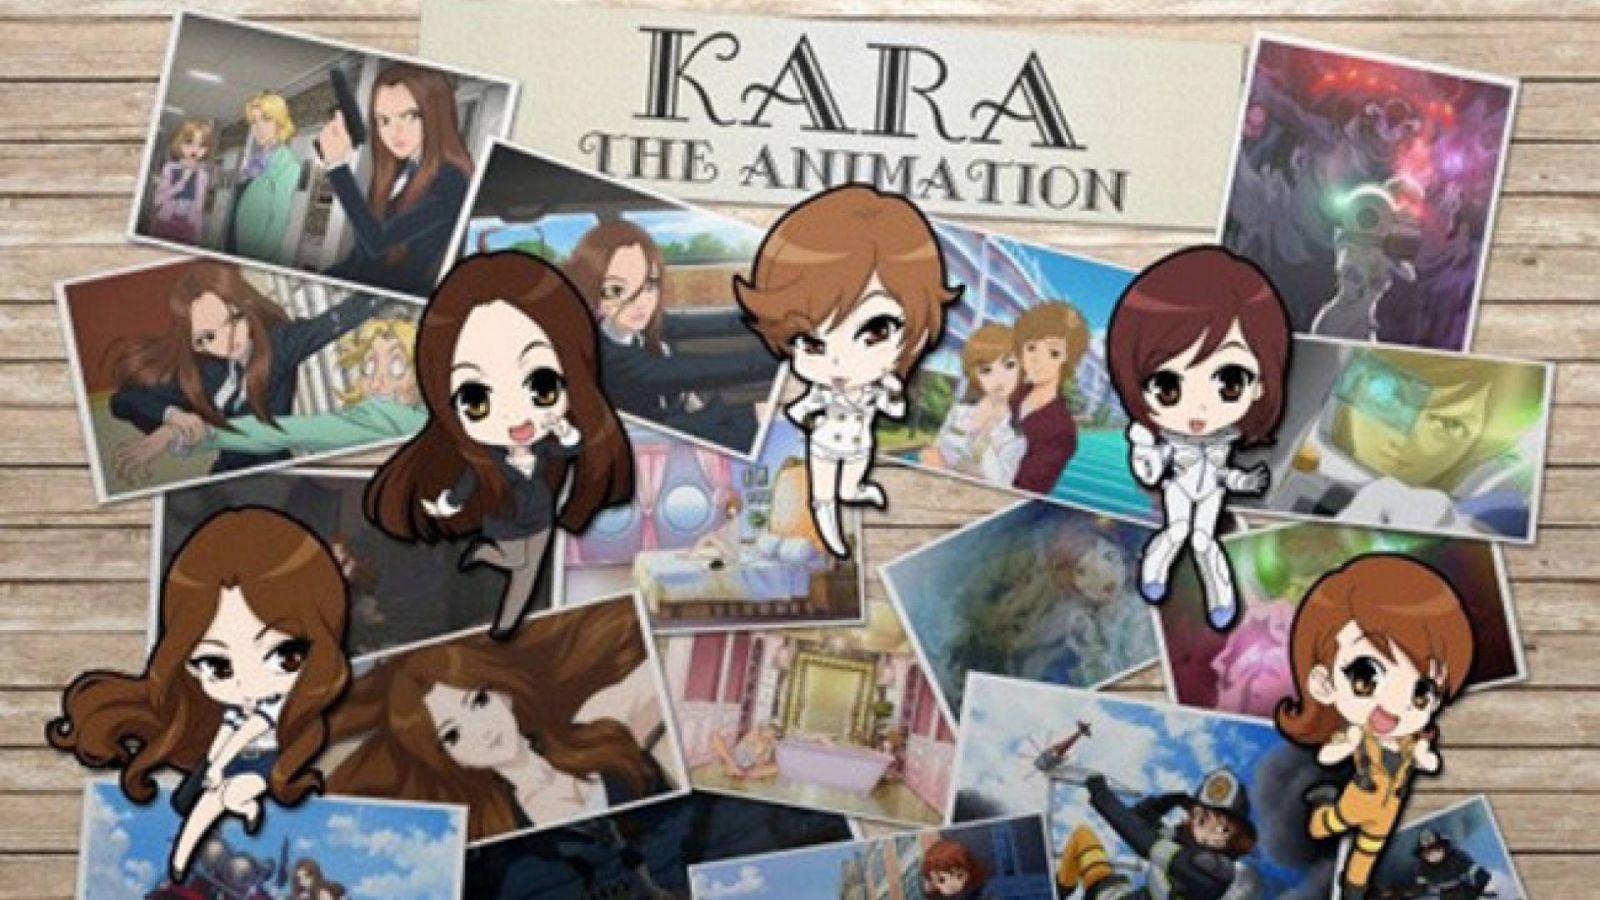 KARA The Animation © DSP Media / Universal Music